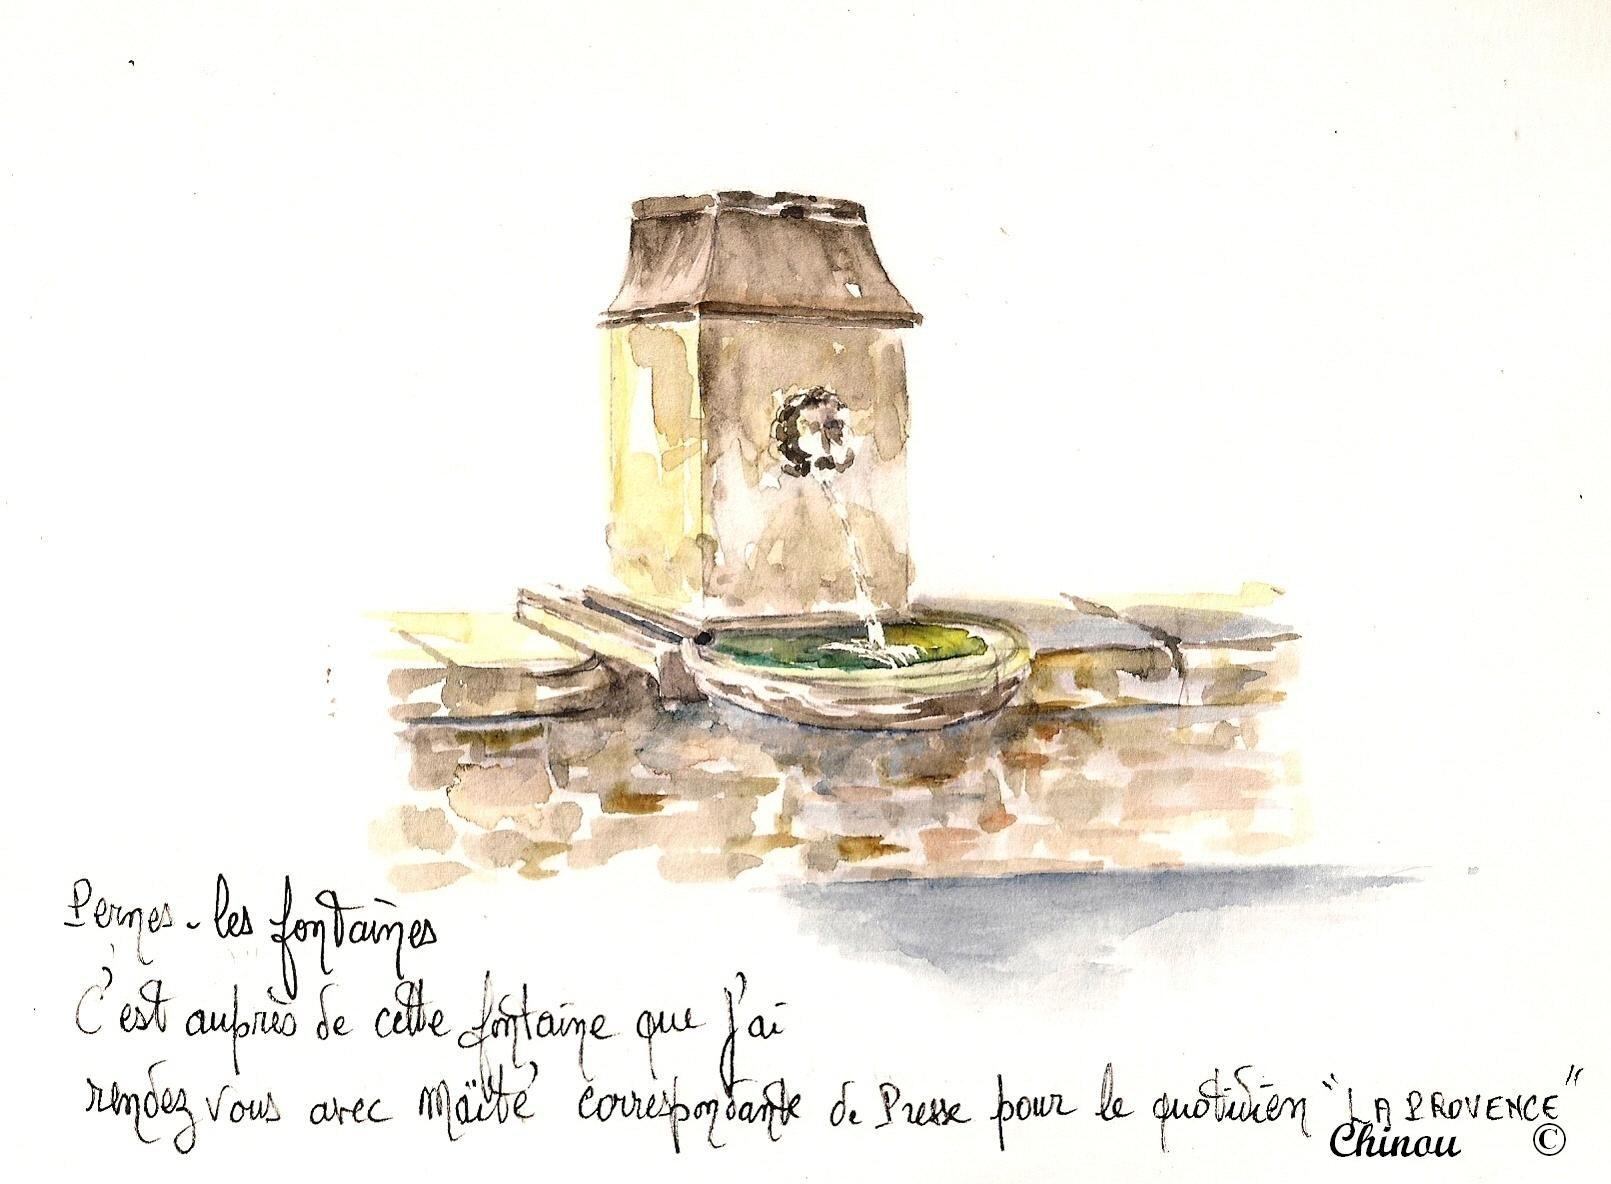 93_Pernes_les_fontaines